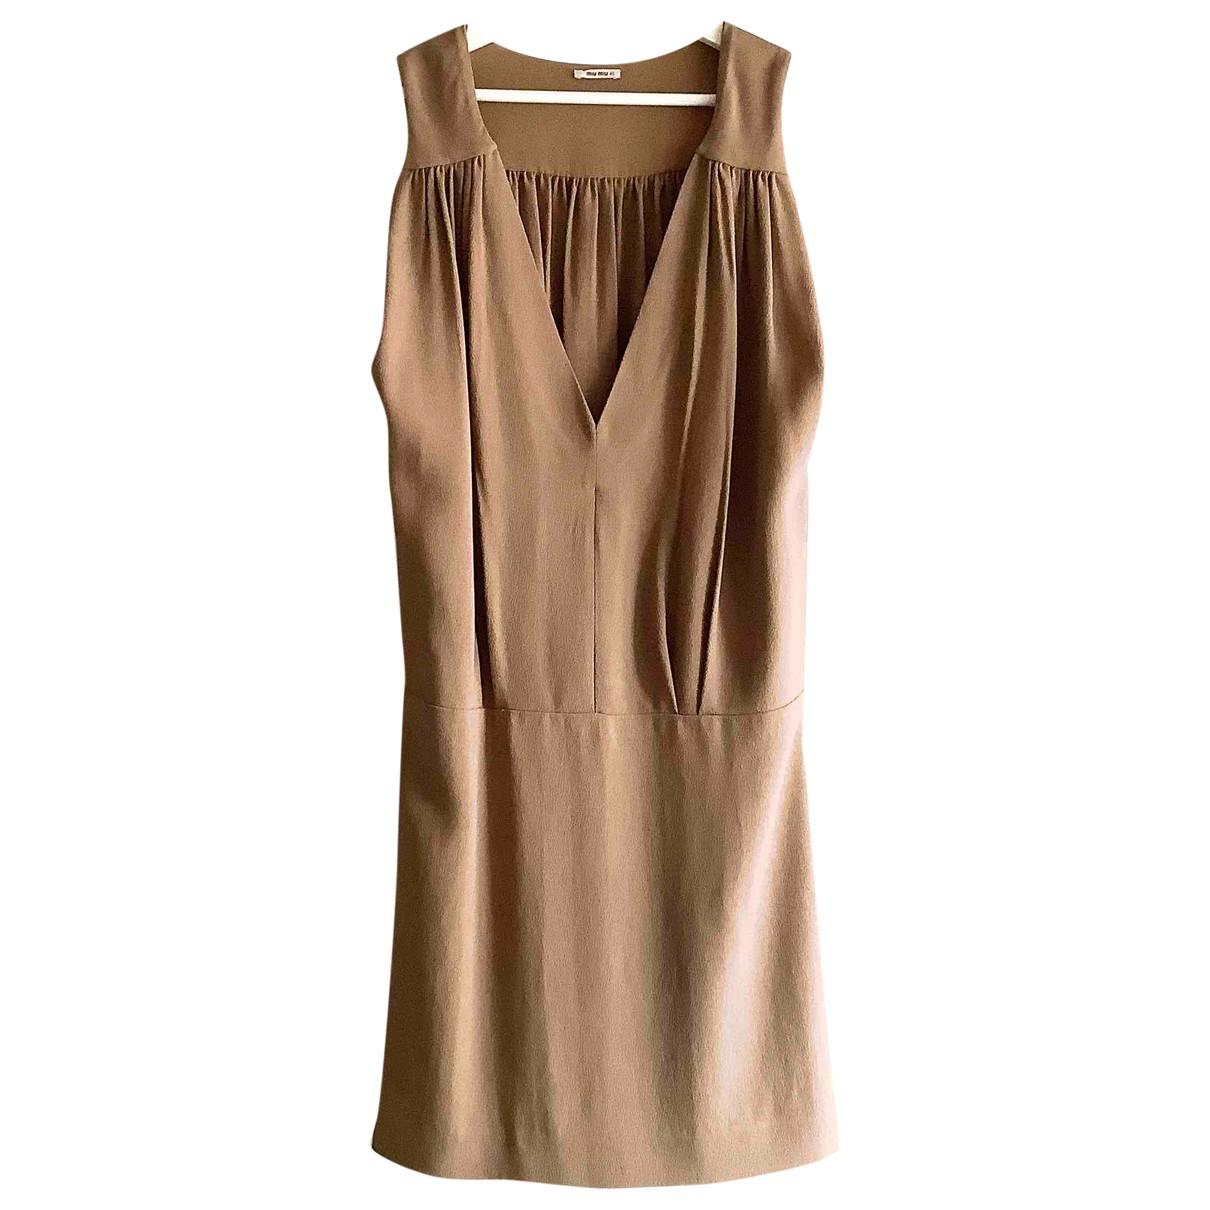 Miu Miu \N Camel dress for Women 40 IT